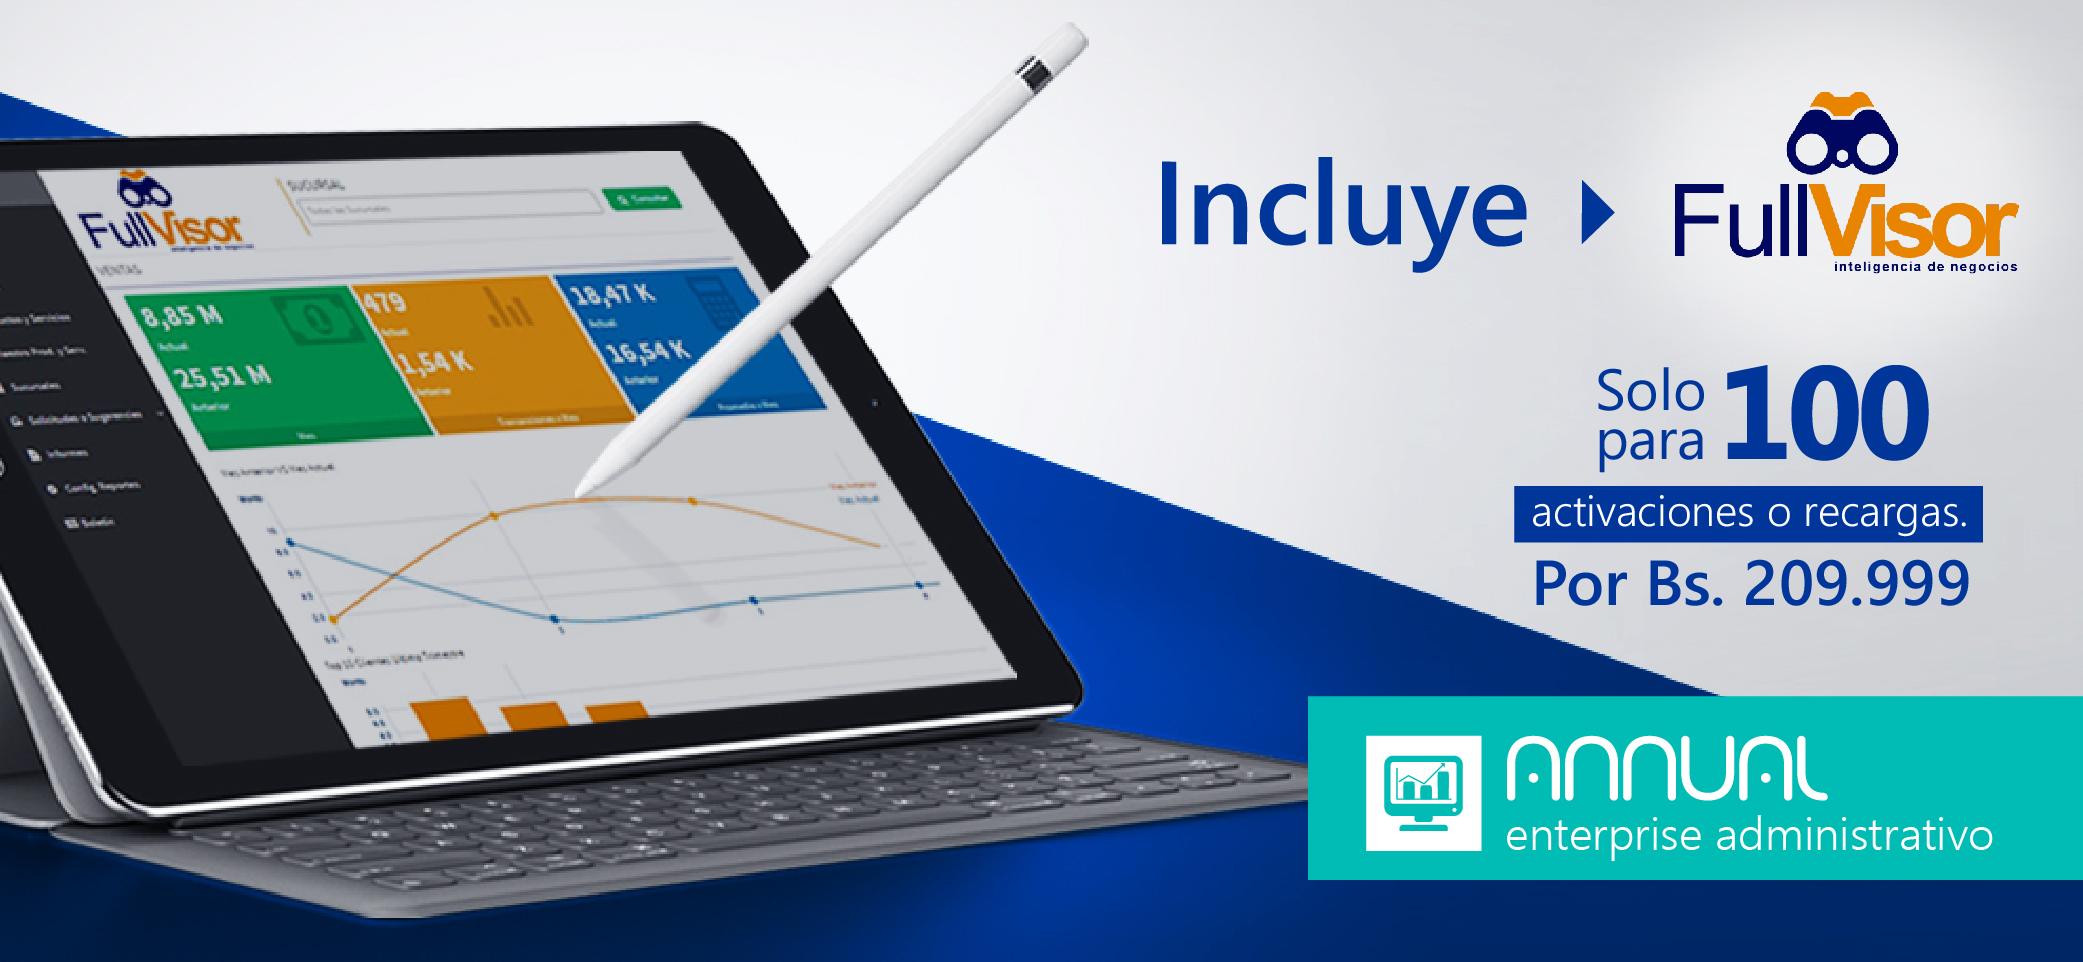 Annual enterprise incluye FullVisor (100 aplicaciones disponibles)